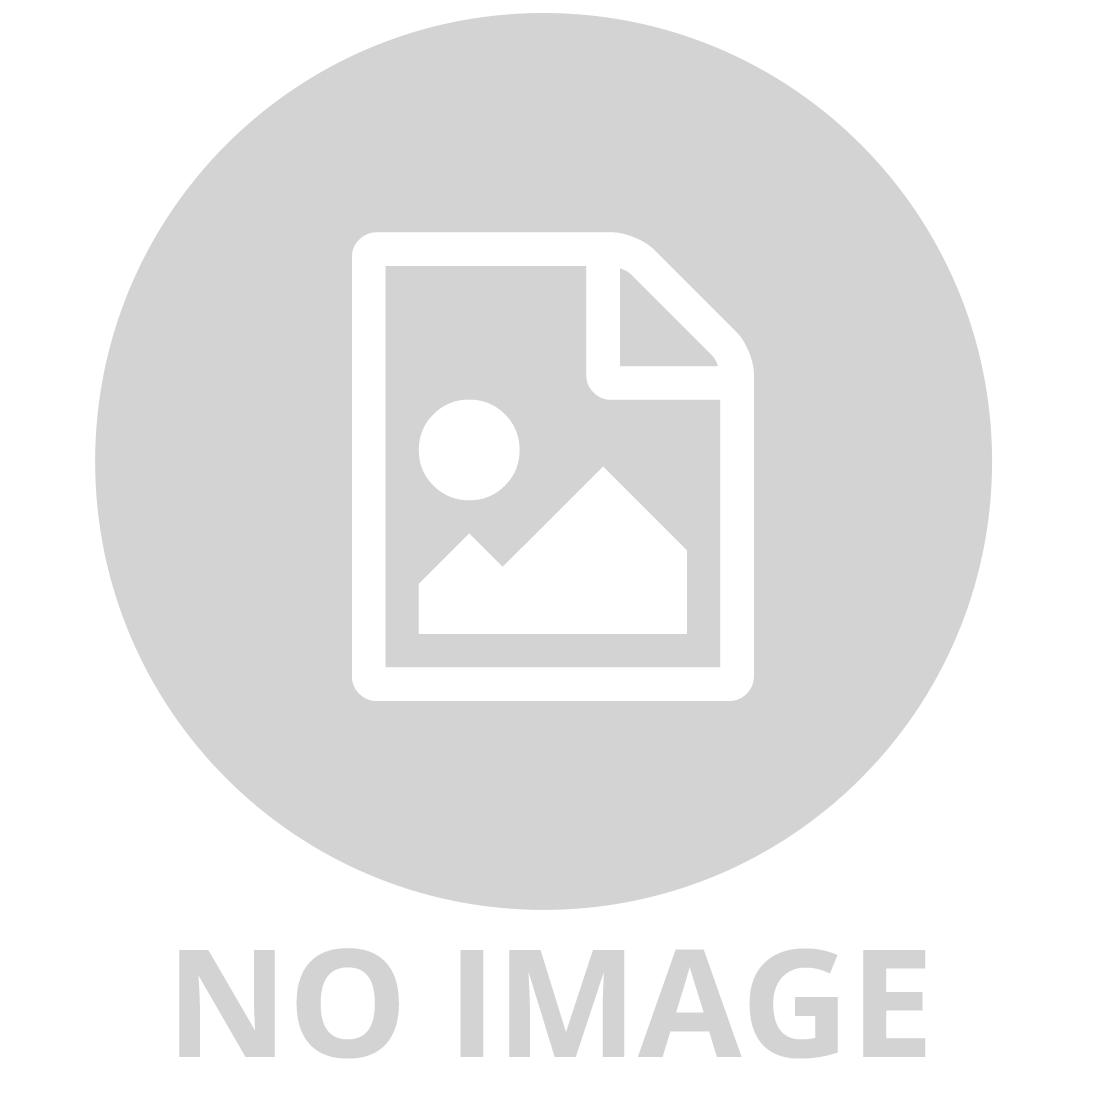 SNOW WHITE SMART GAMES